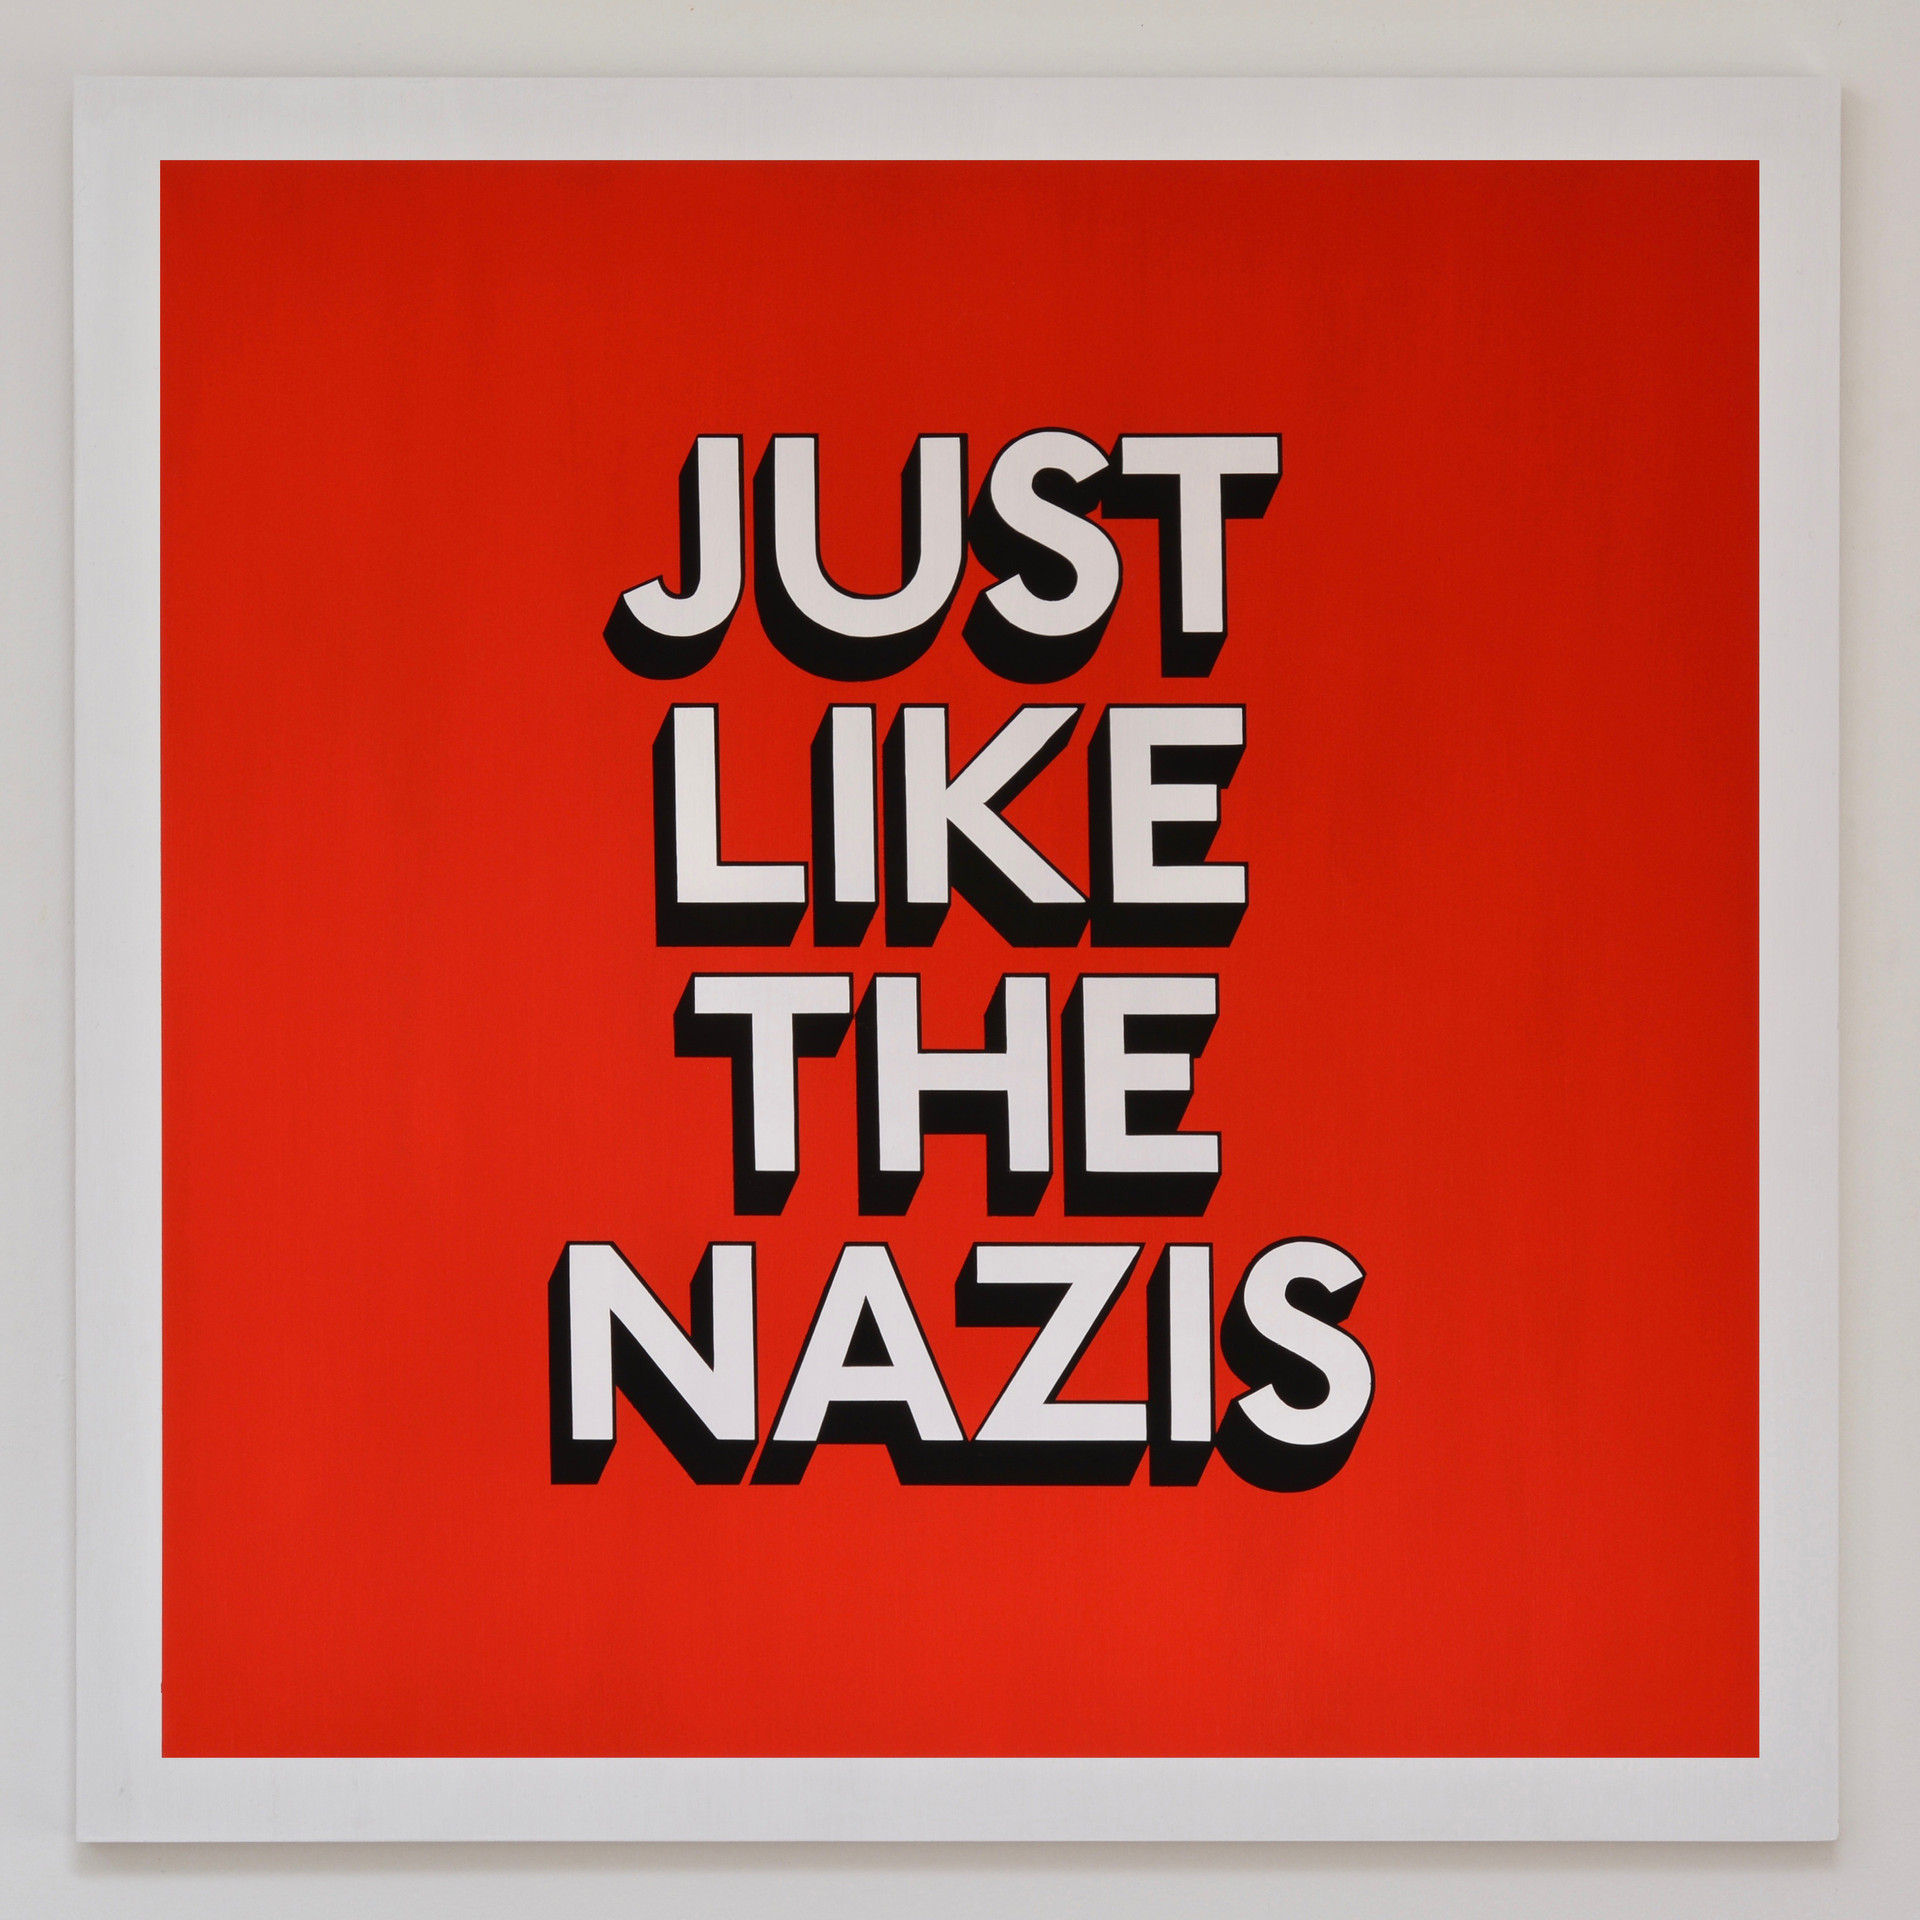 JUST_LIKE_THE_NAZIS.jpg